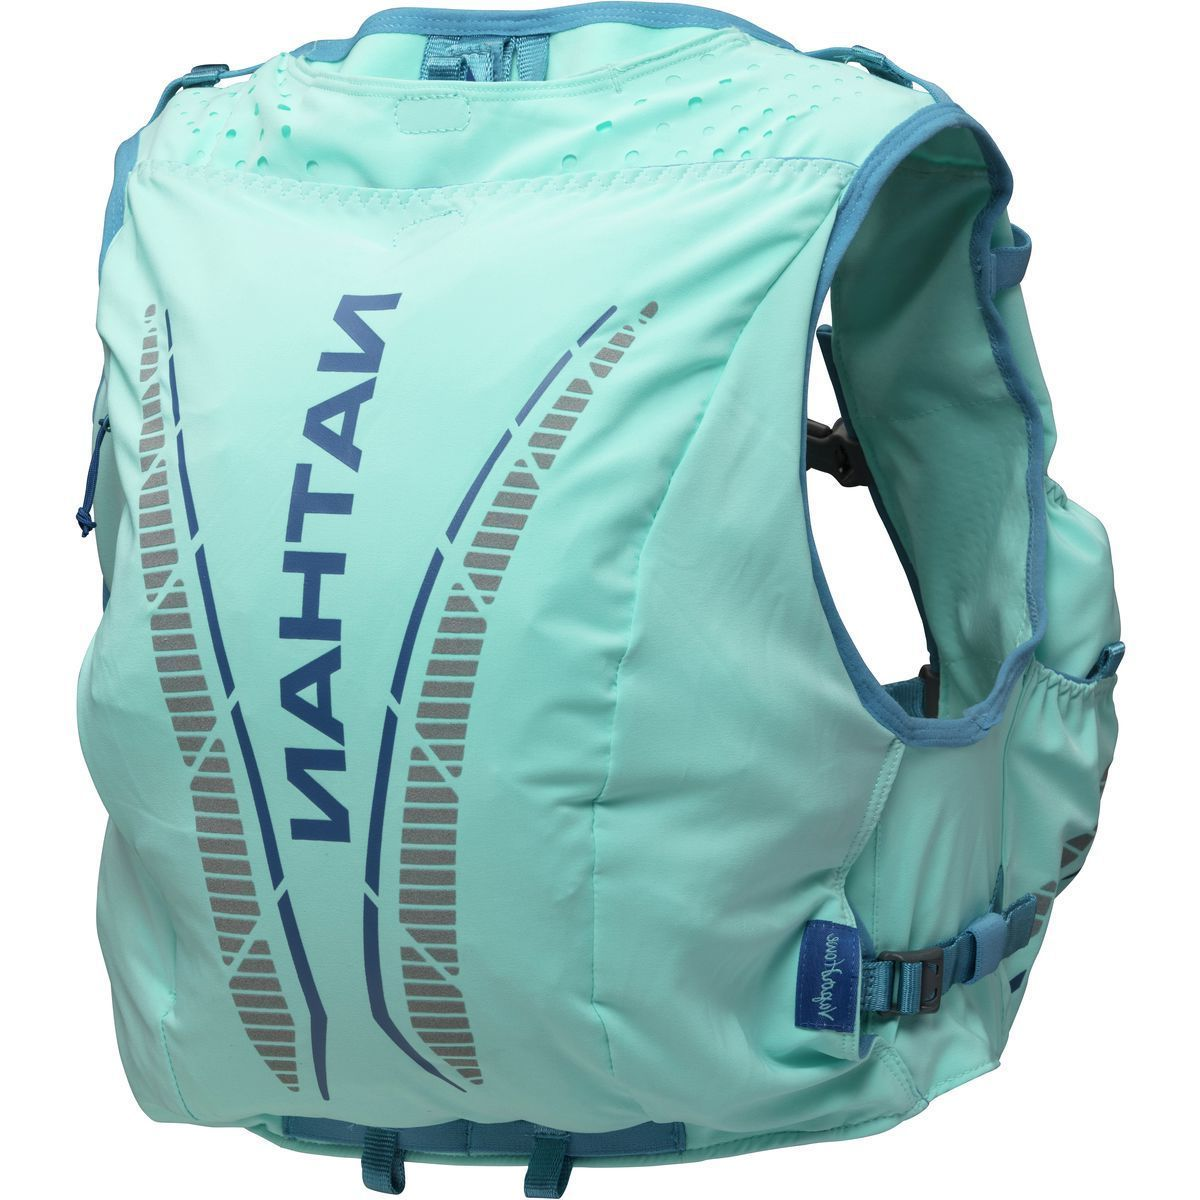 Nathan VaporHowe 12L Hydration Vest - Women's